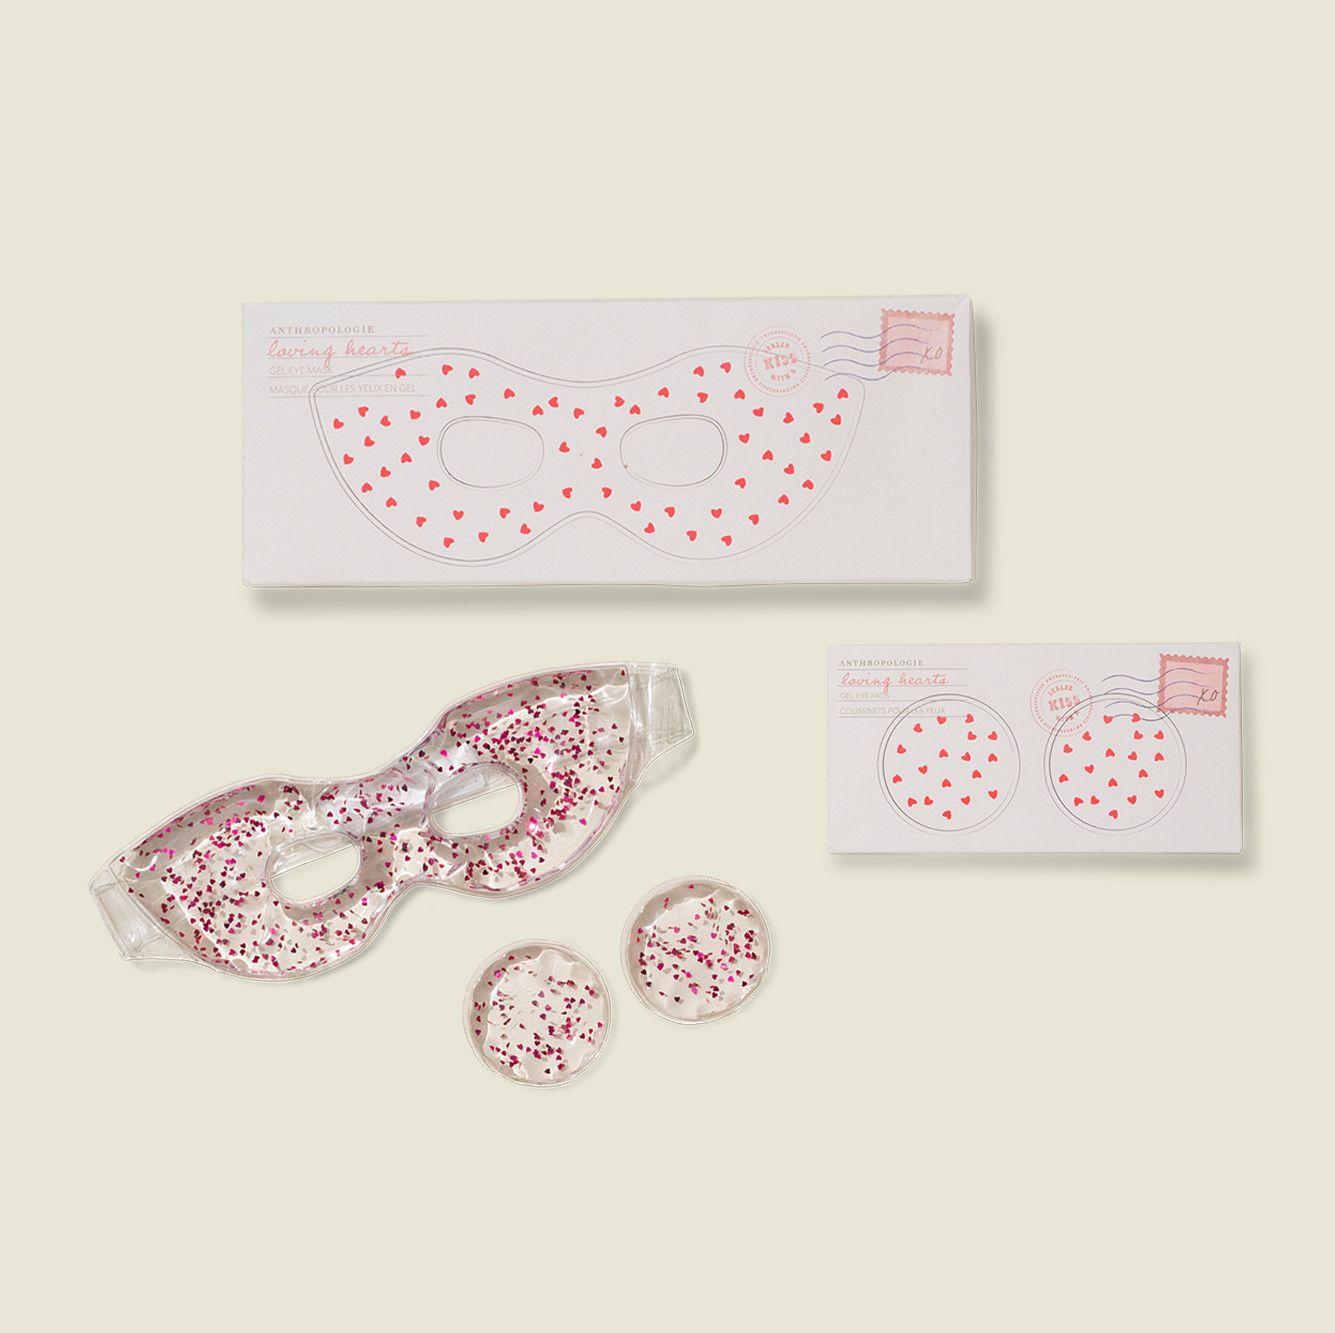 Custom packaging with glitter eye mask and eye pads